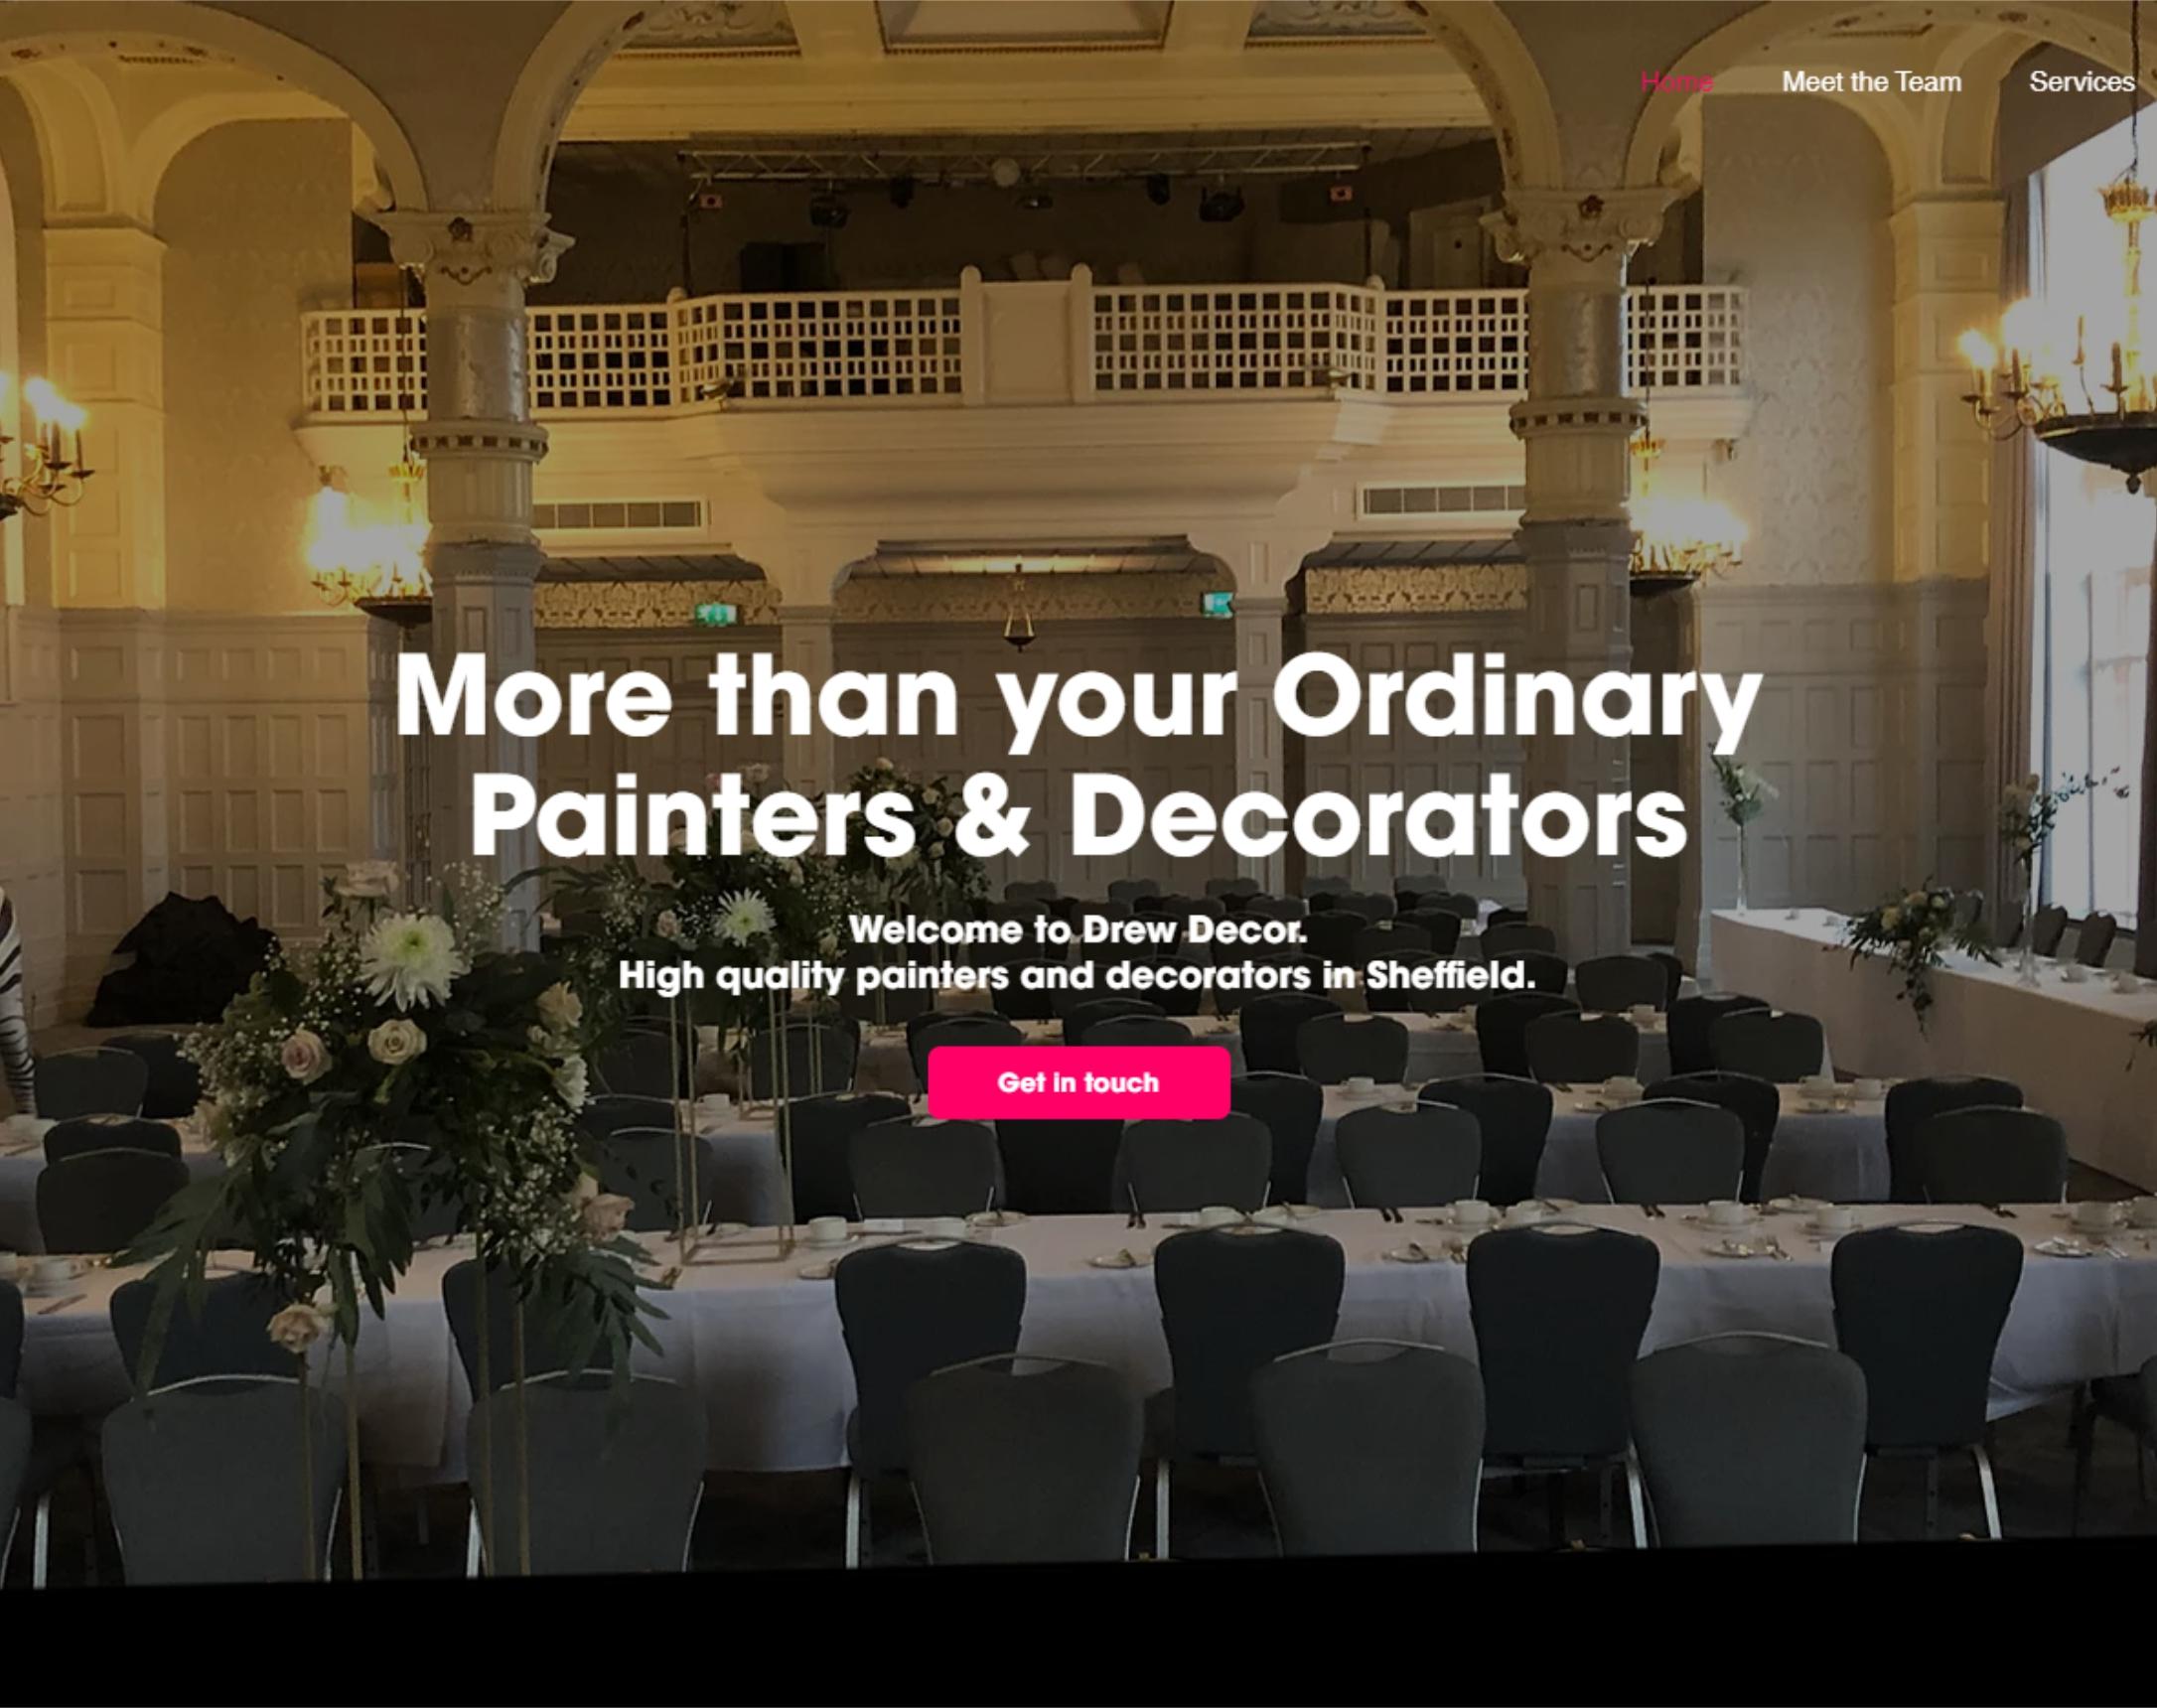 Drew Decor Drew Decor. High quality painters and decorators i...